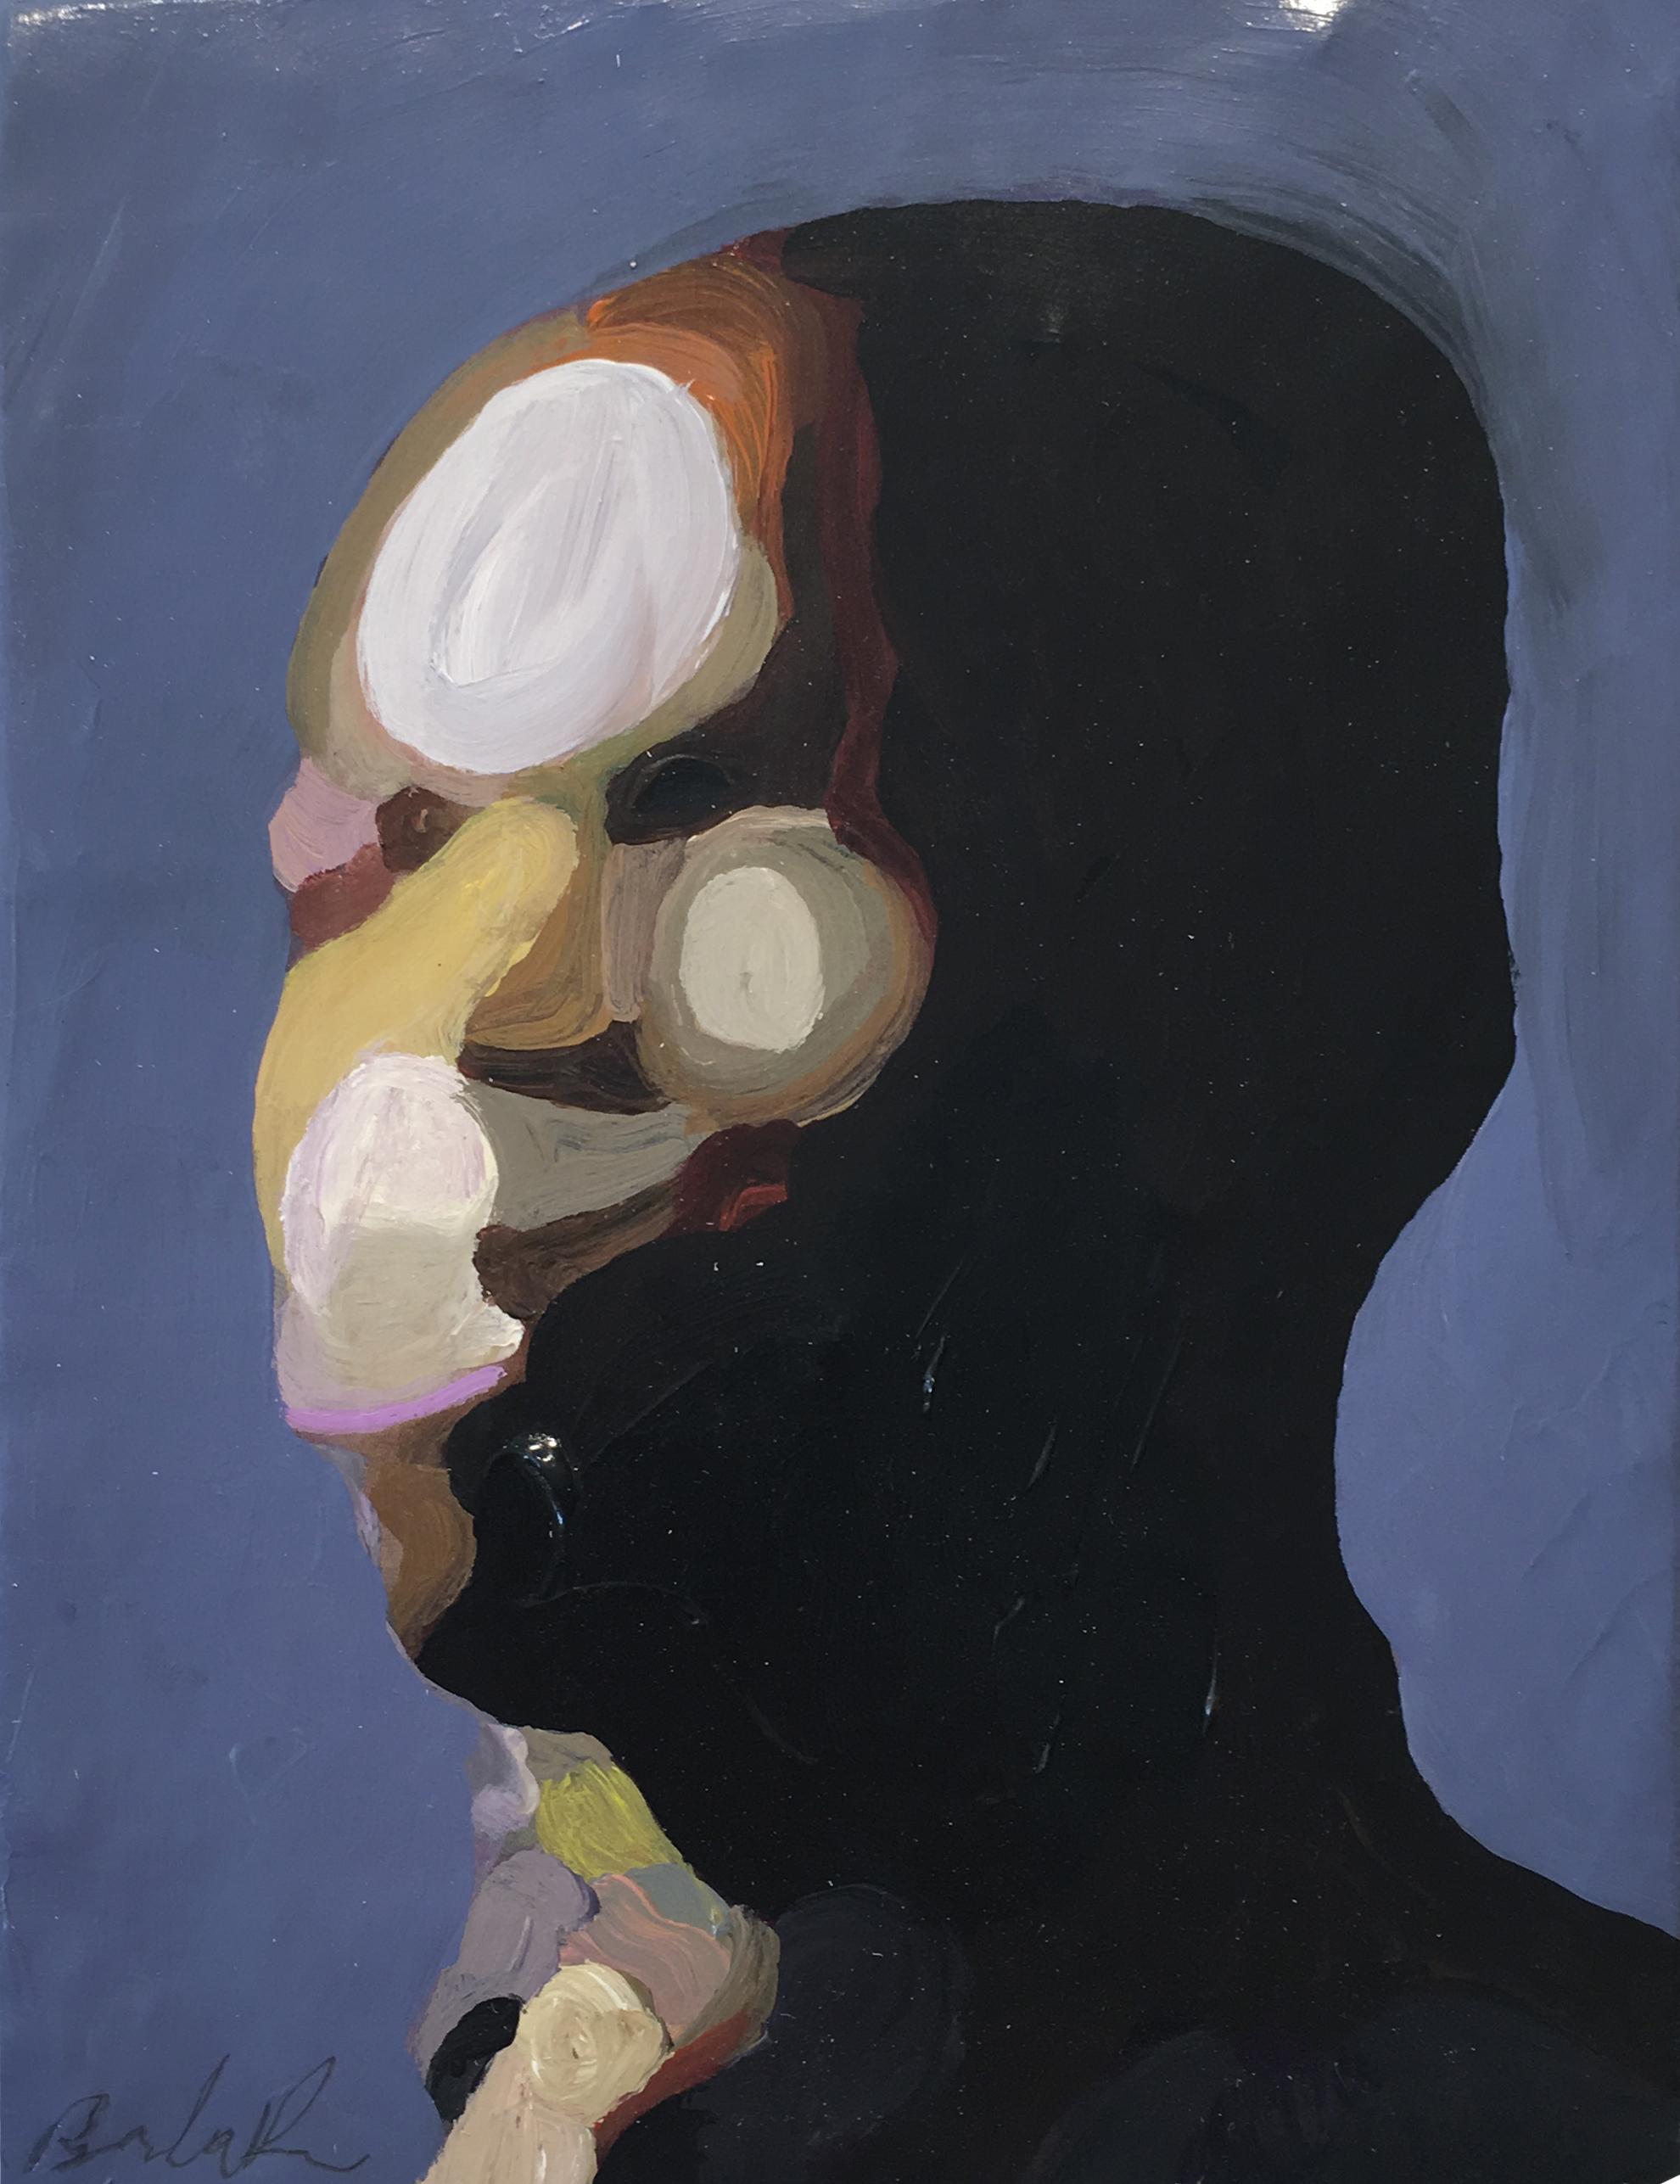 Untitled 1 by Philippe Boulakia